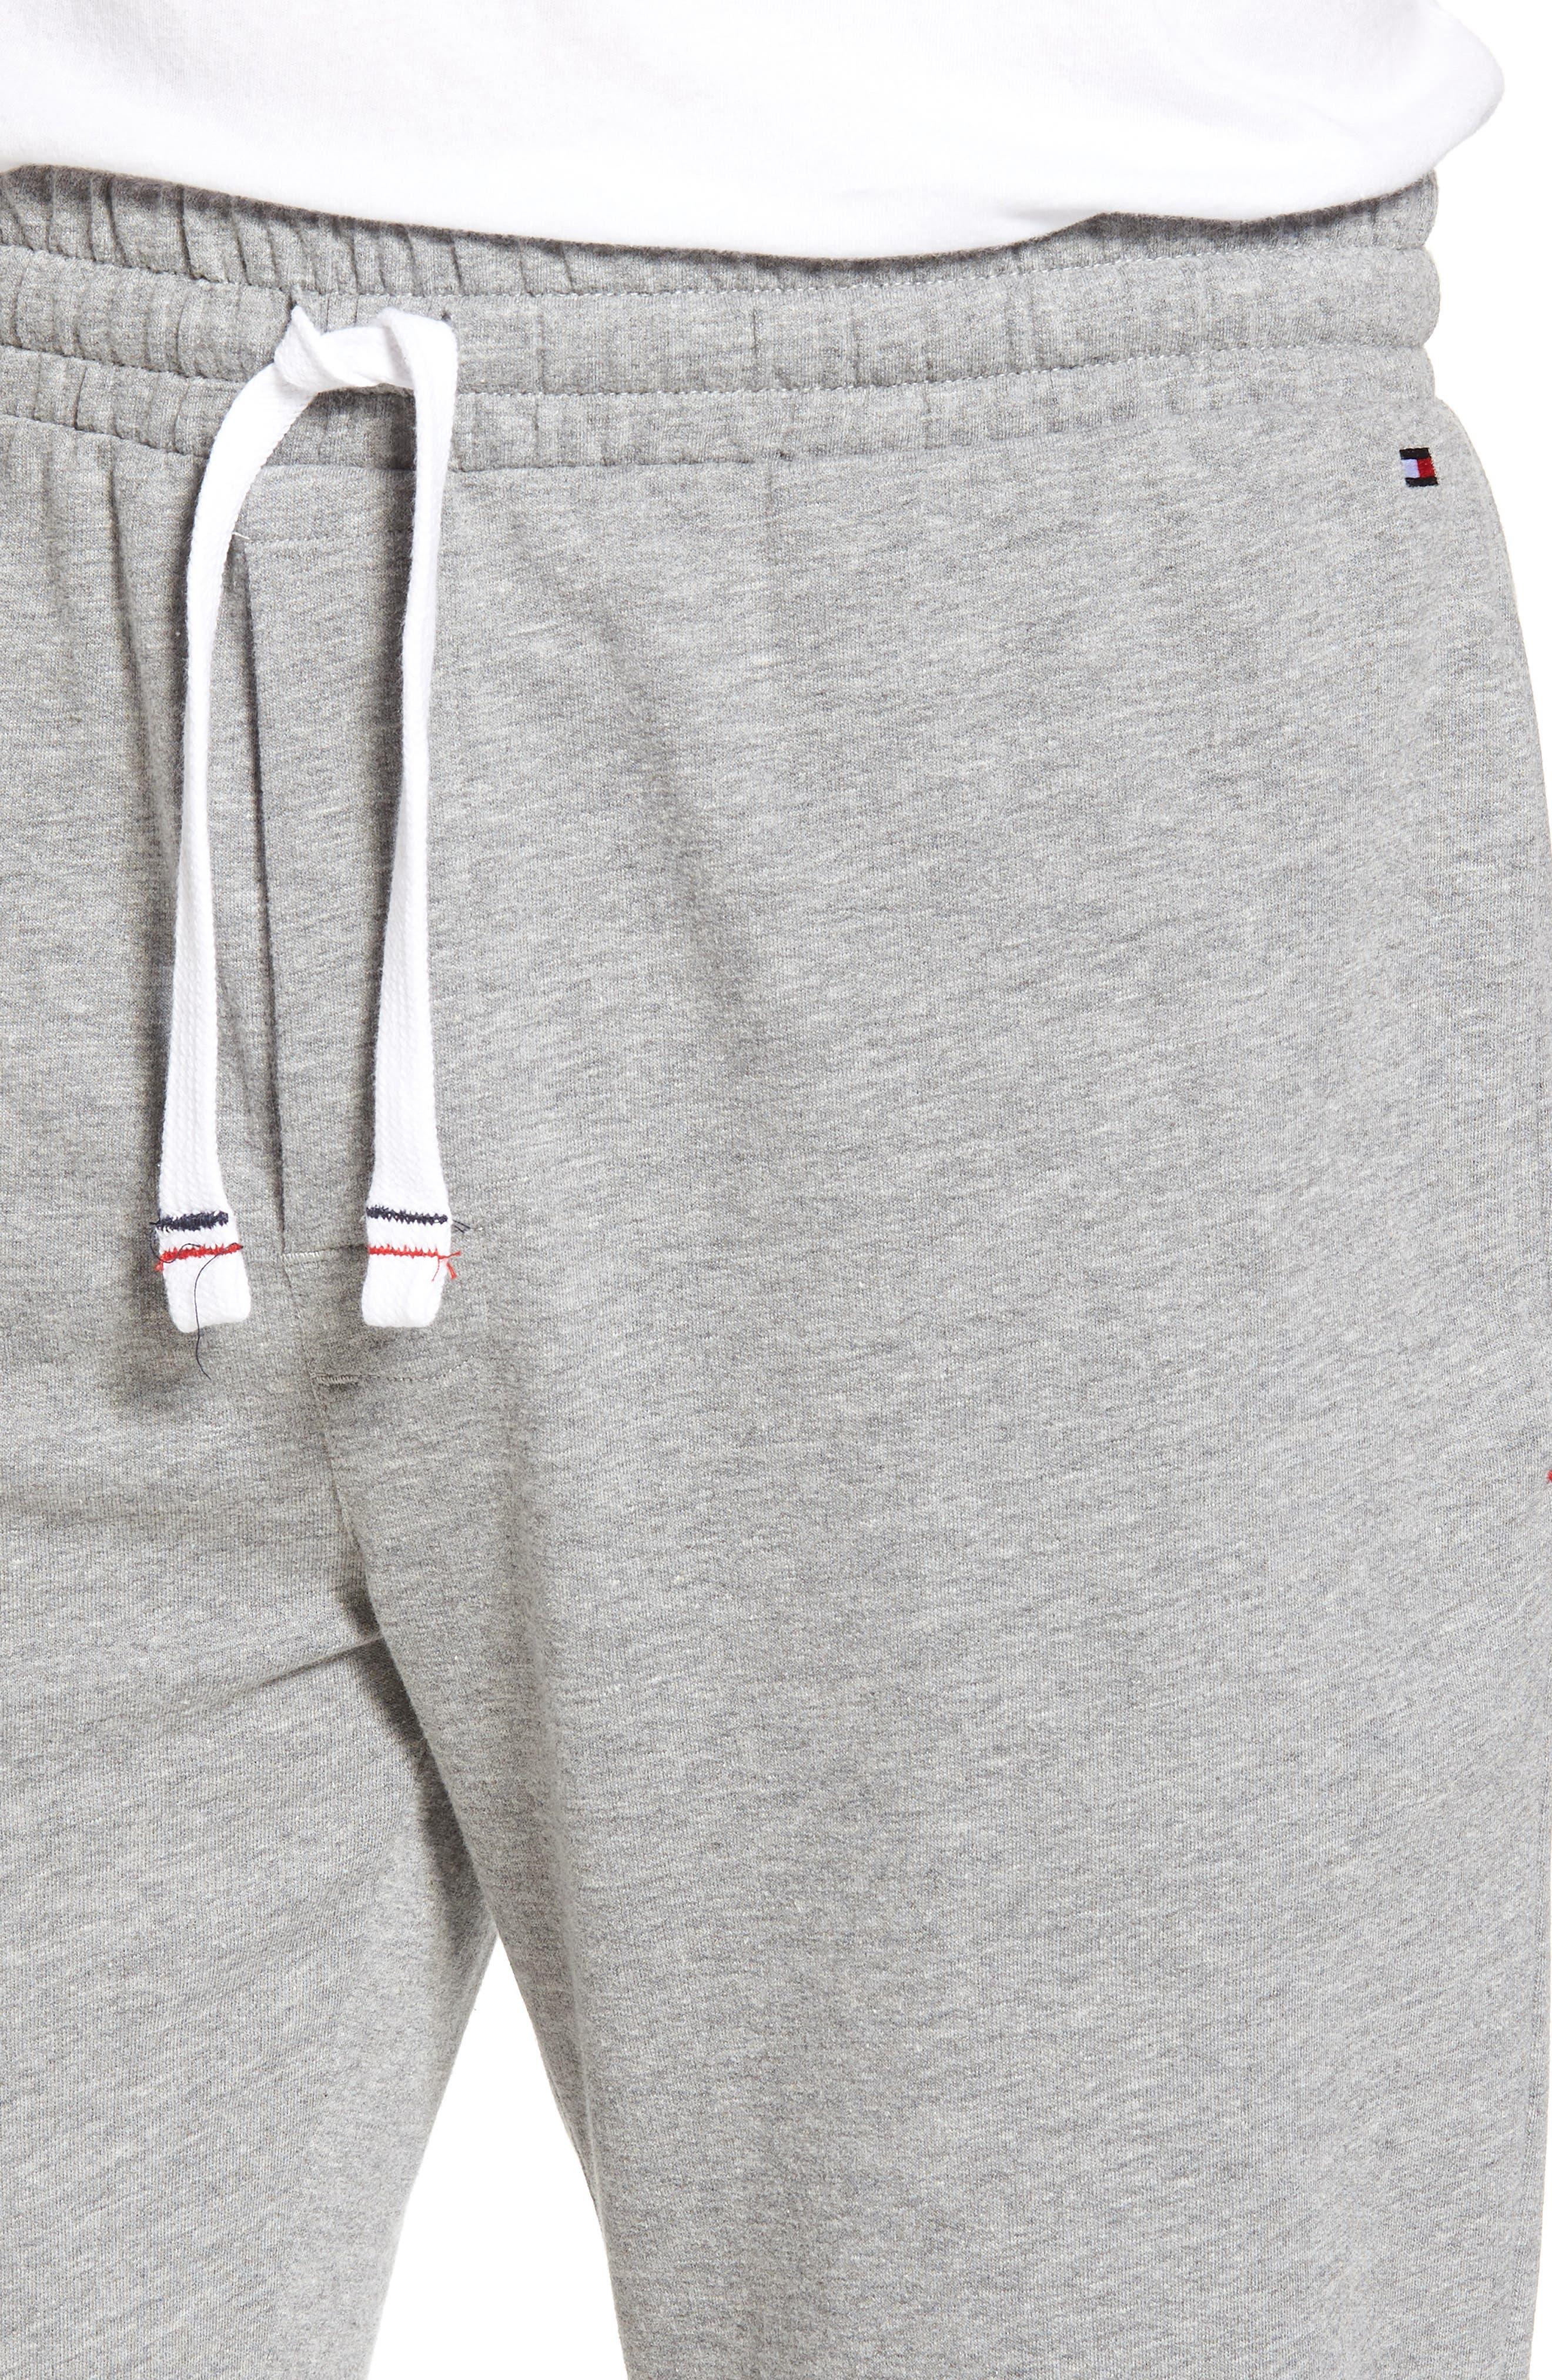 Jogger Lounge Pants,                             Alternate thumbnail 4, color,                             GREY HEATHER